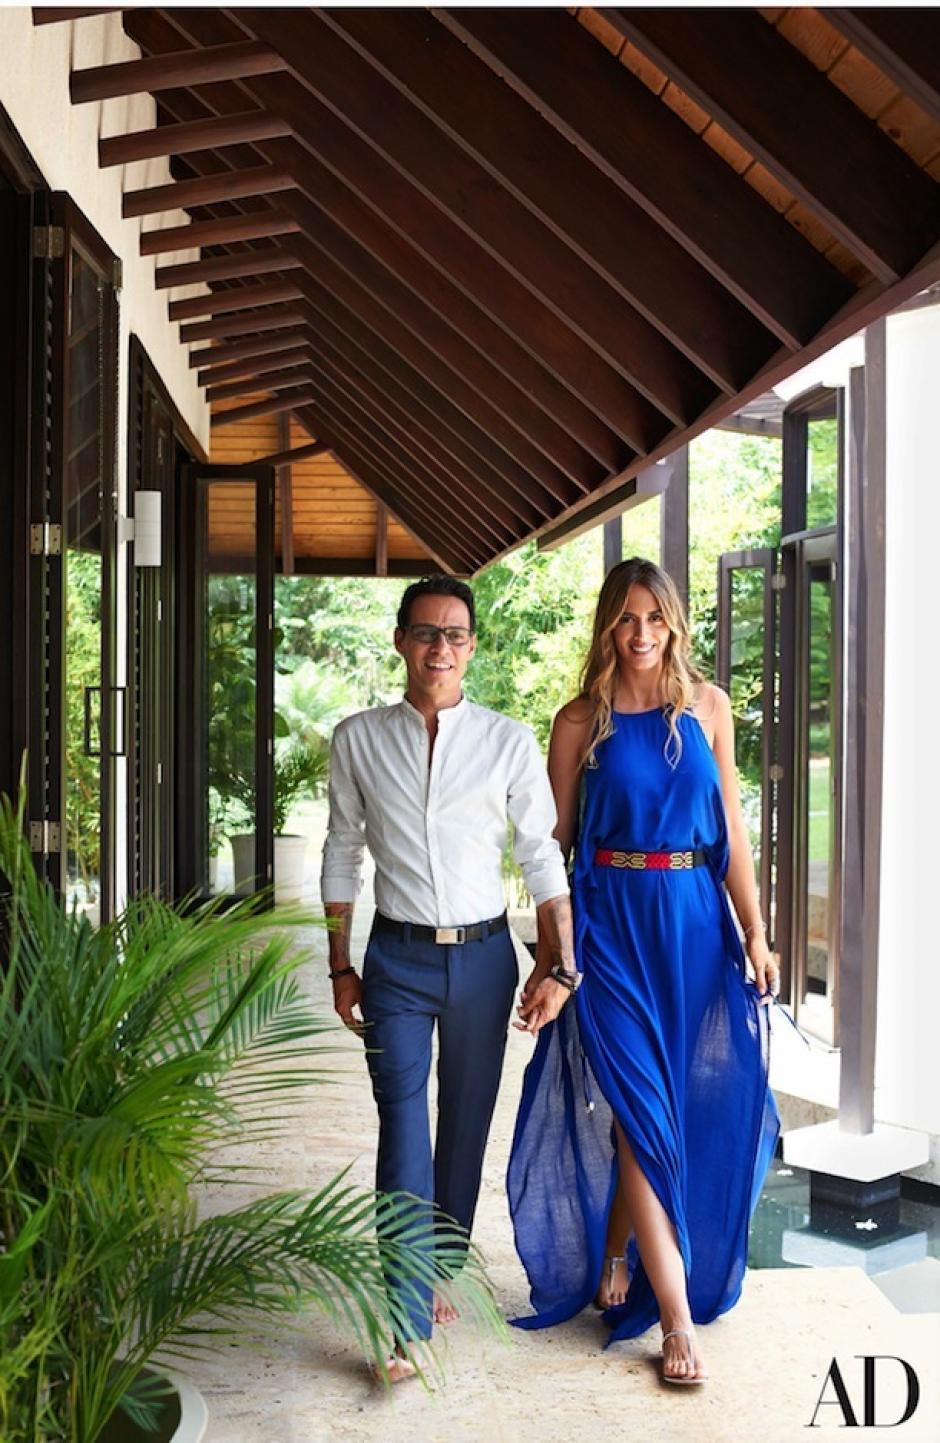 Marc abrió las puertas a la revista Architectural Digest. (Foto:  Architectural Digest)